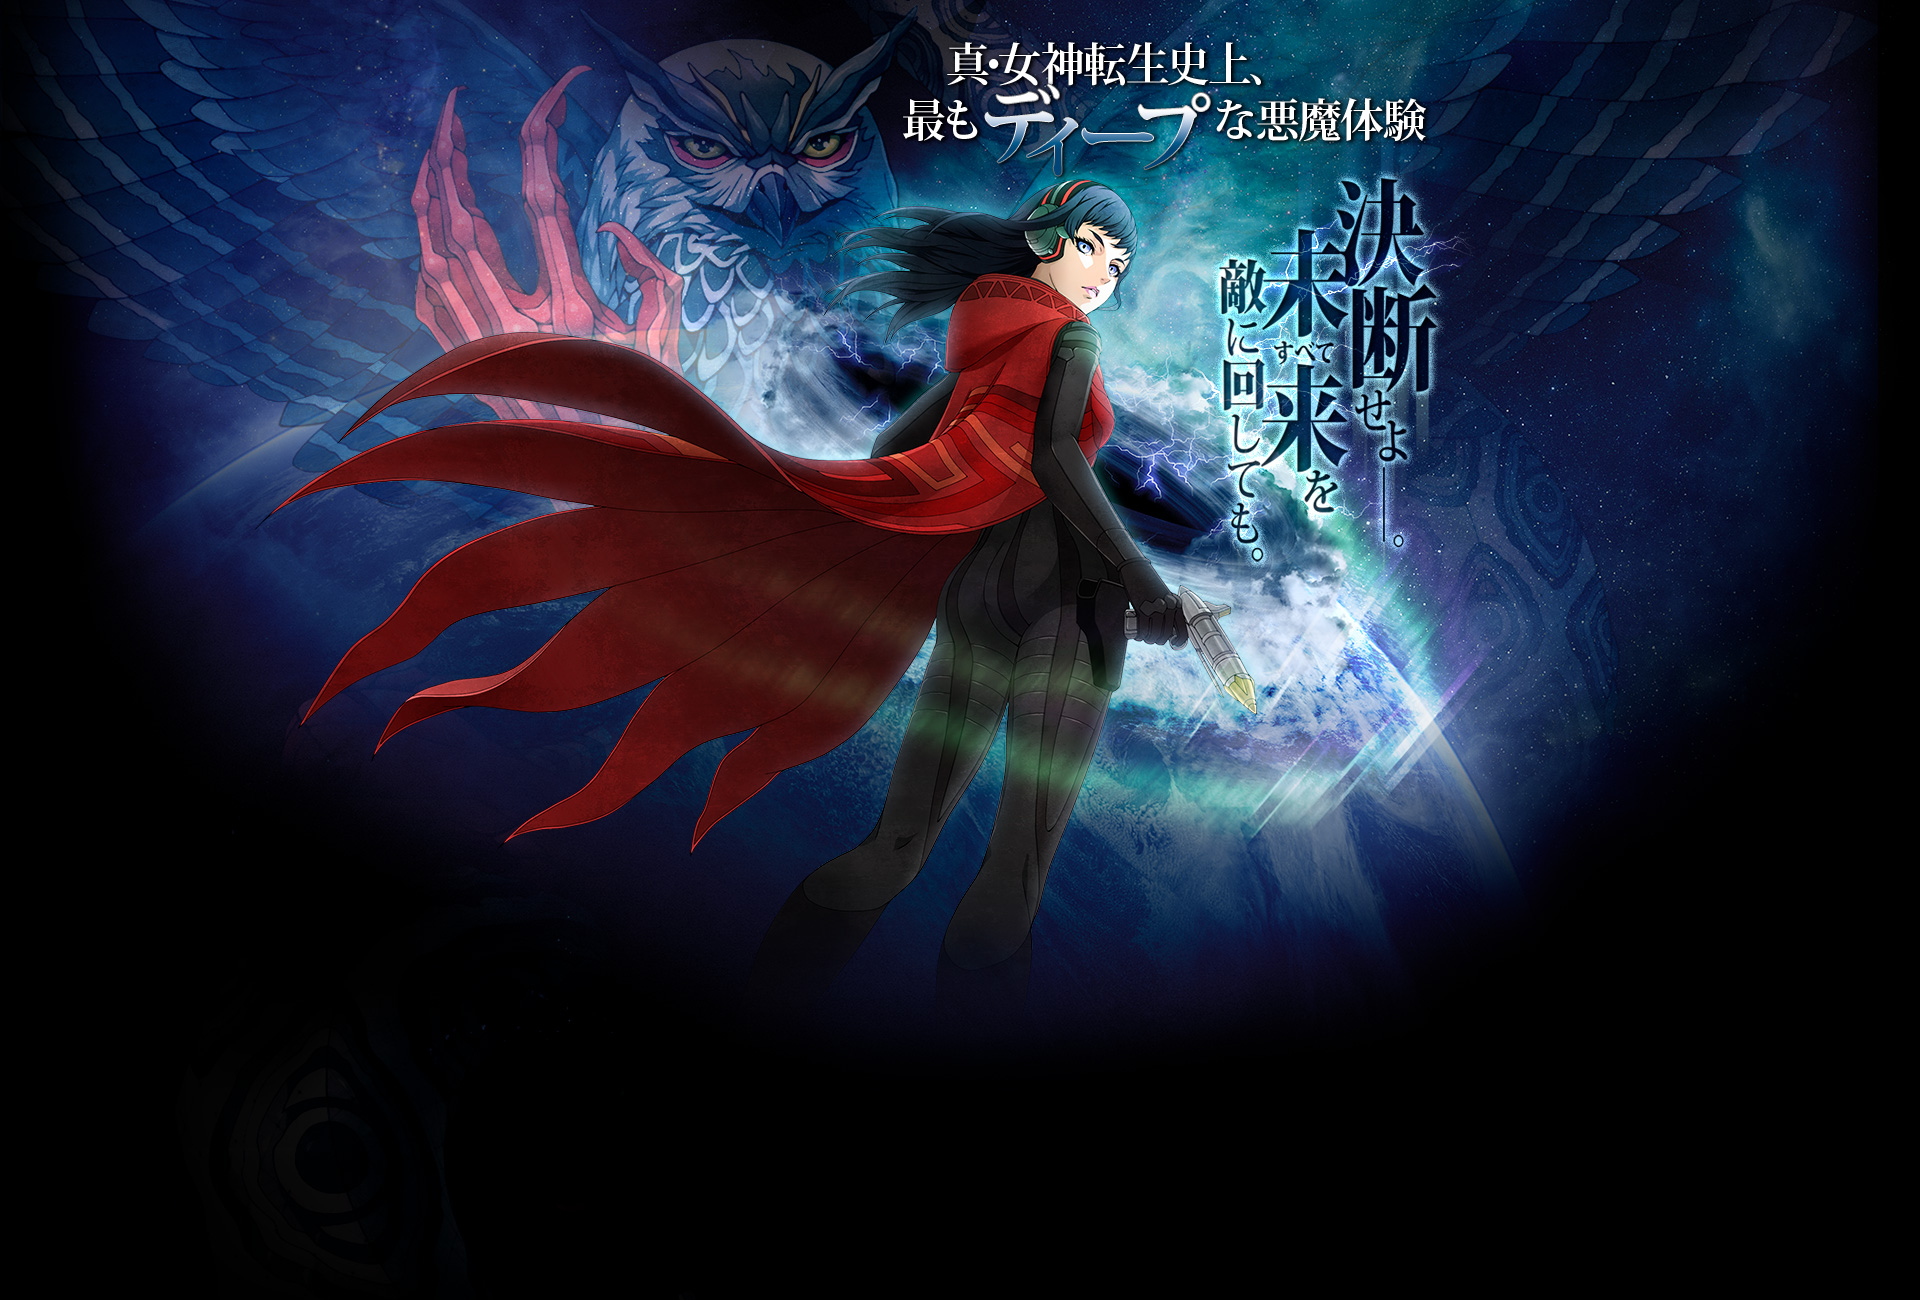 Shin Megami Tensei- Deep Strange Journey